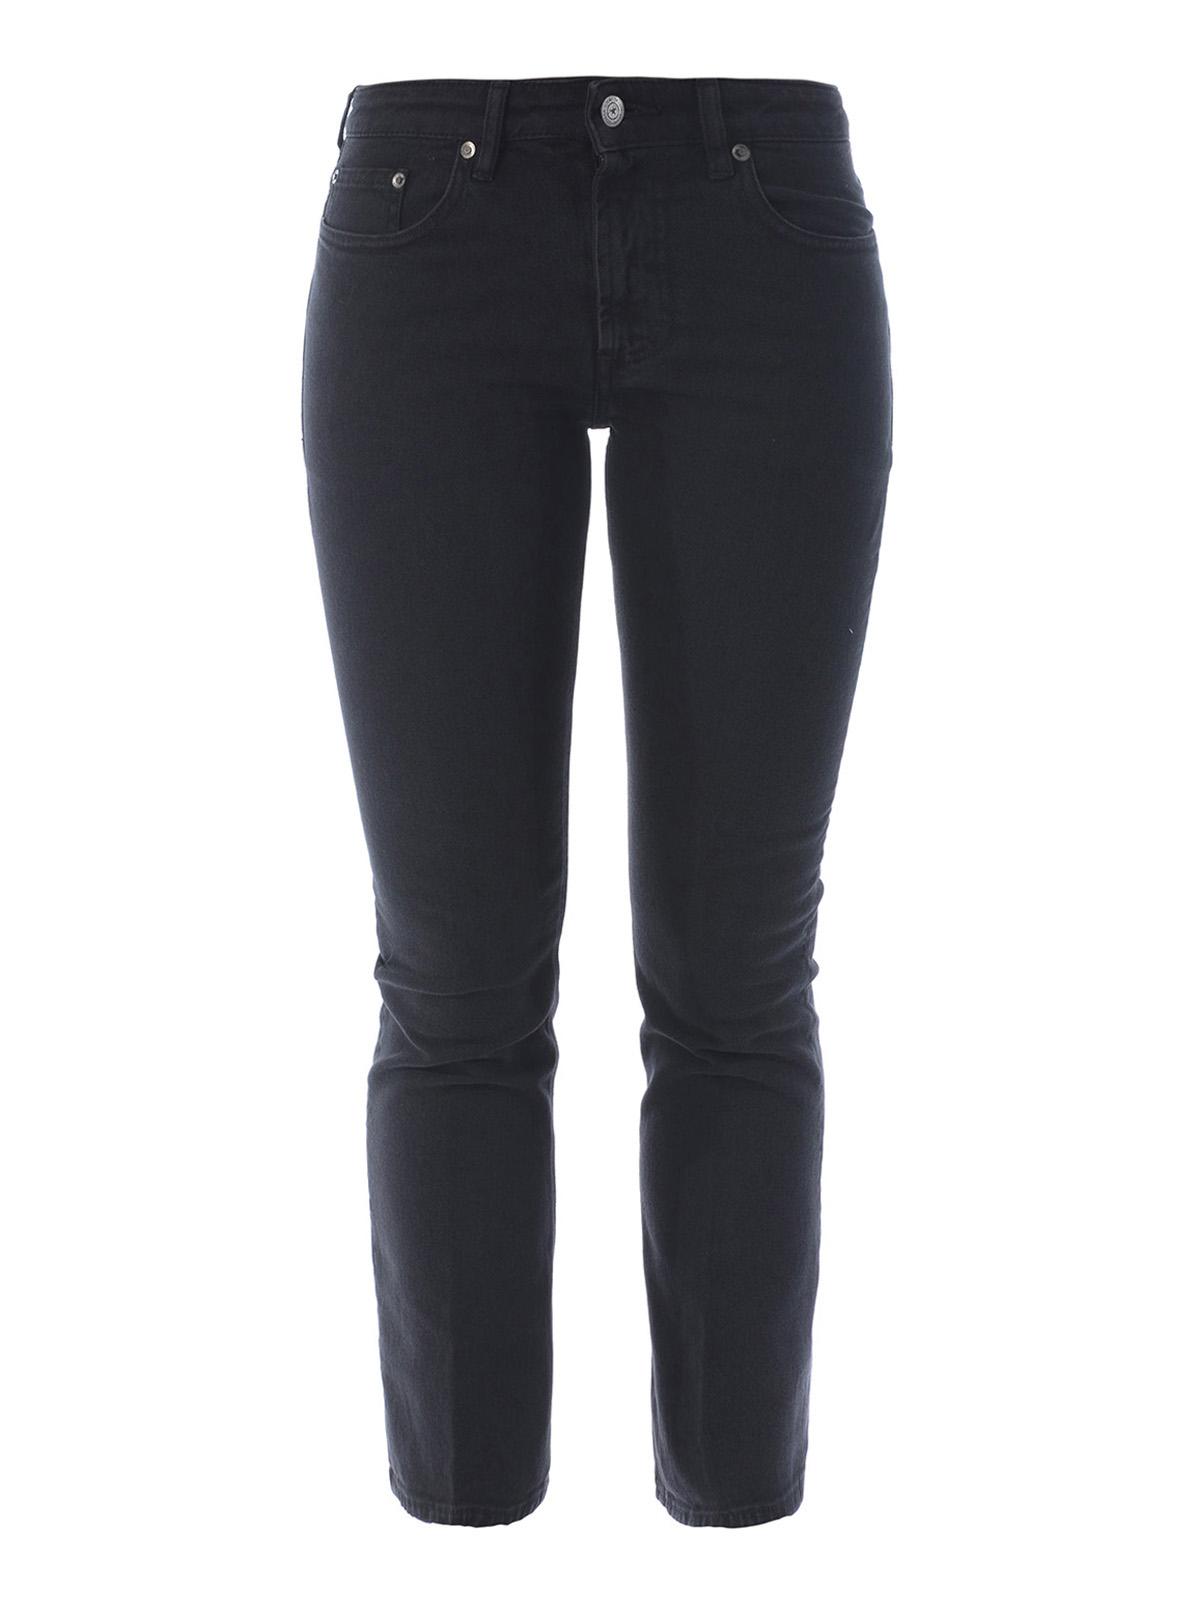 denim cropped bootcut jeans by golden goose bootcut jeans ikrix. Black Bedroom Furniture Sets. Home Design Ideas